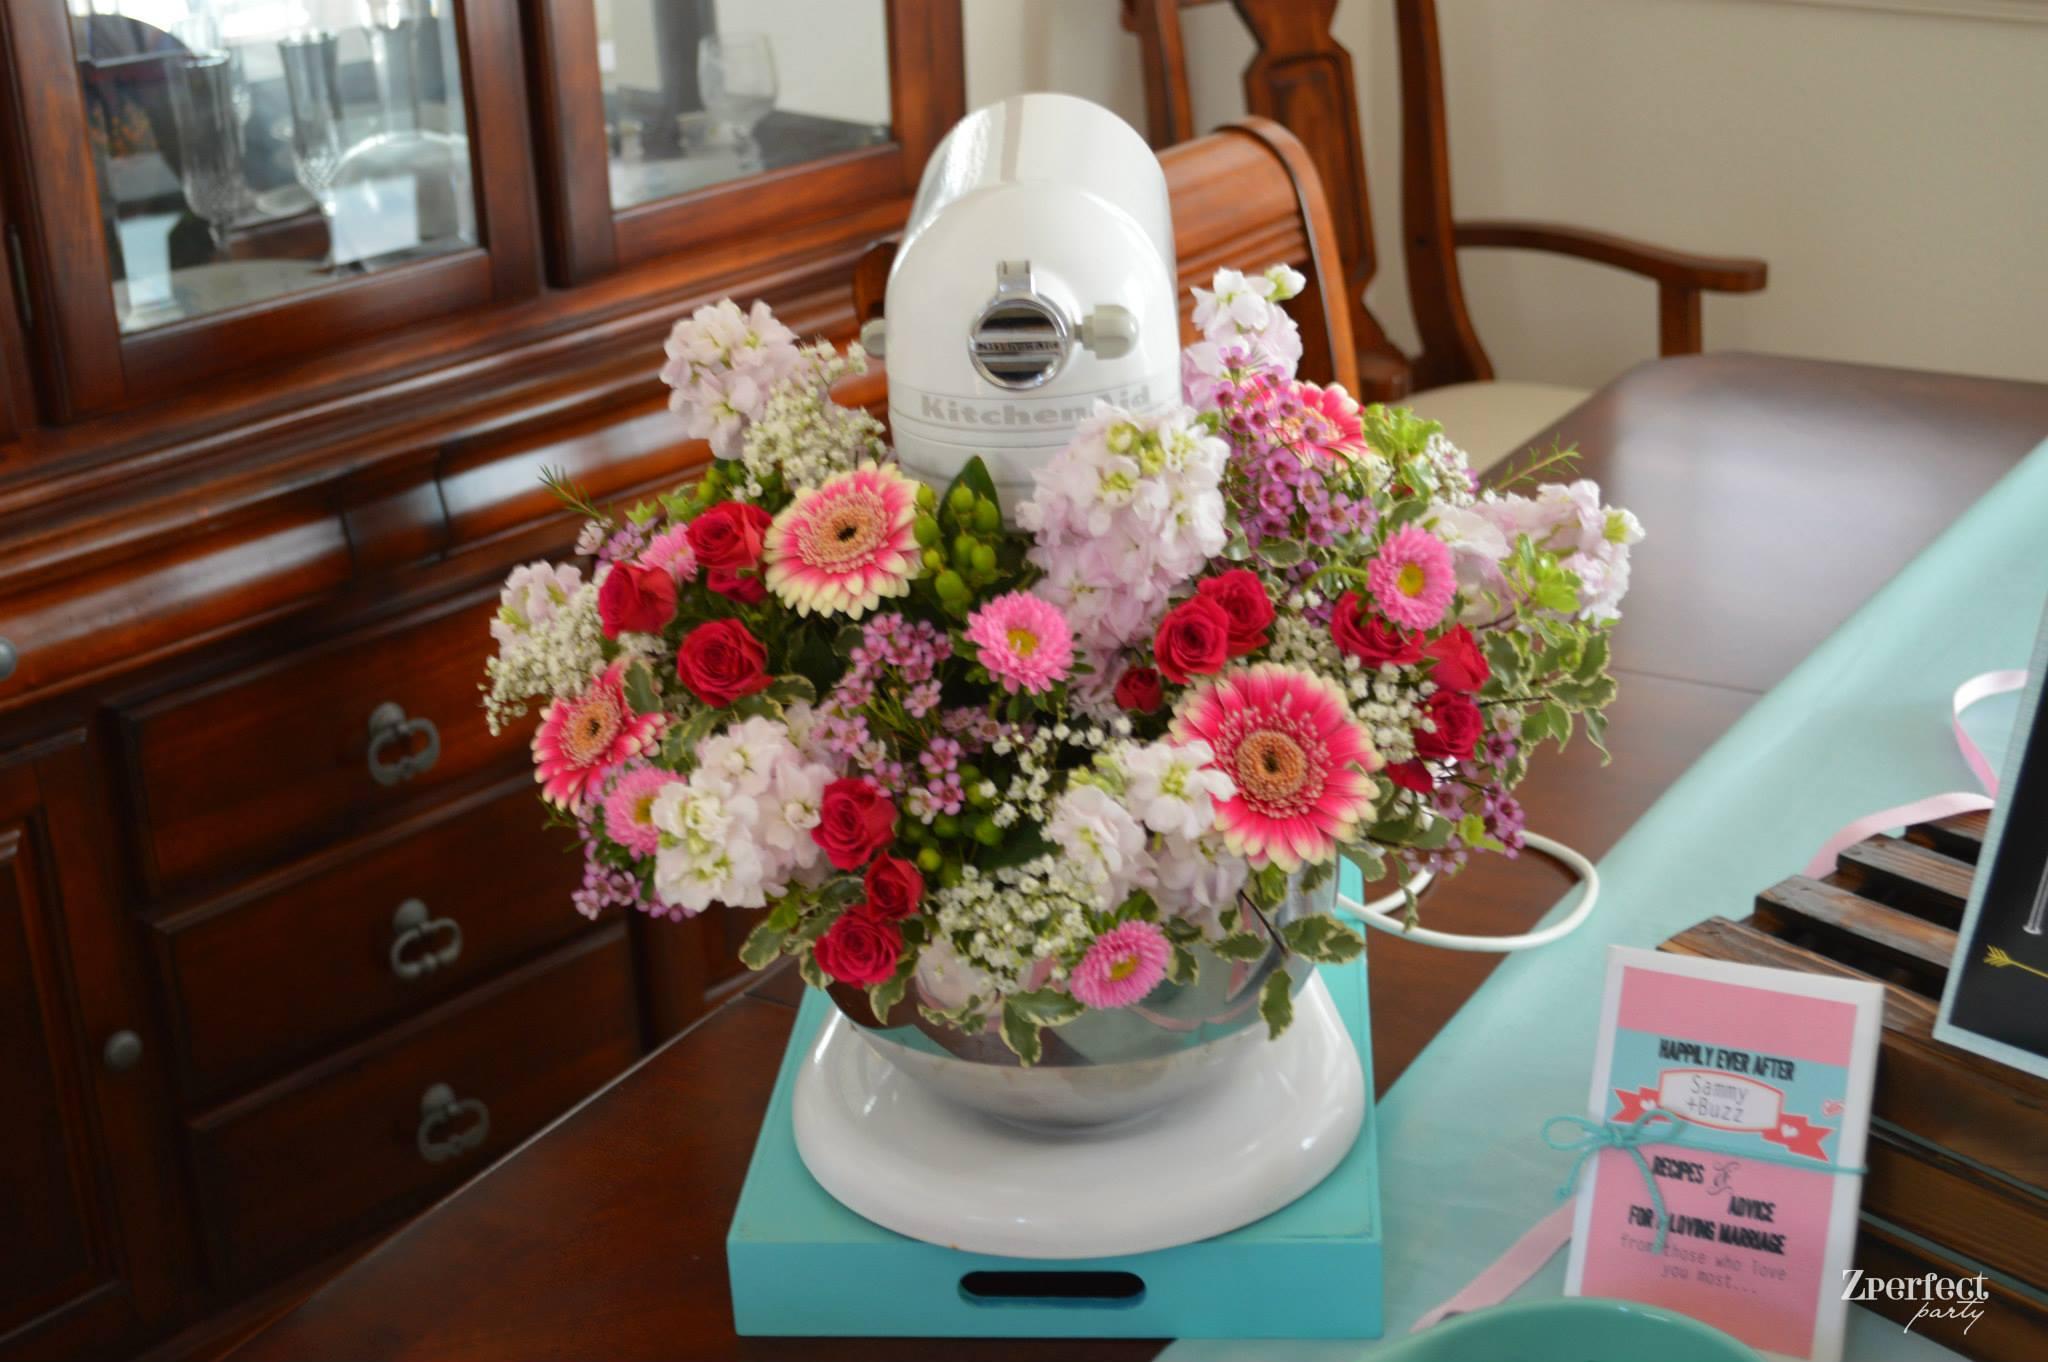 Kitchen Themed Bridal Shower Invitations